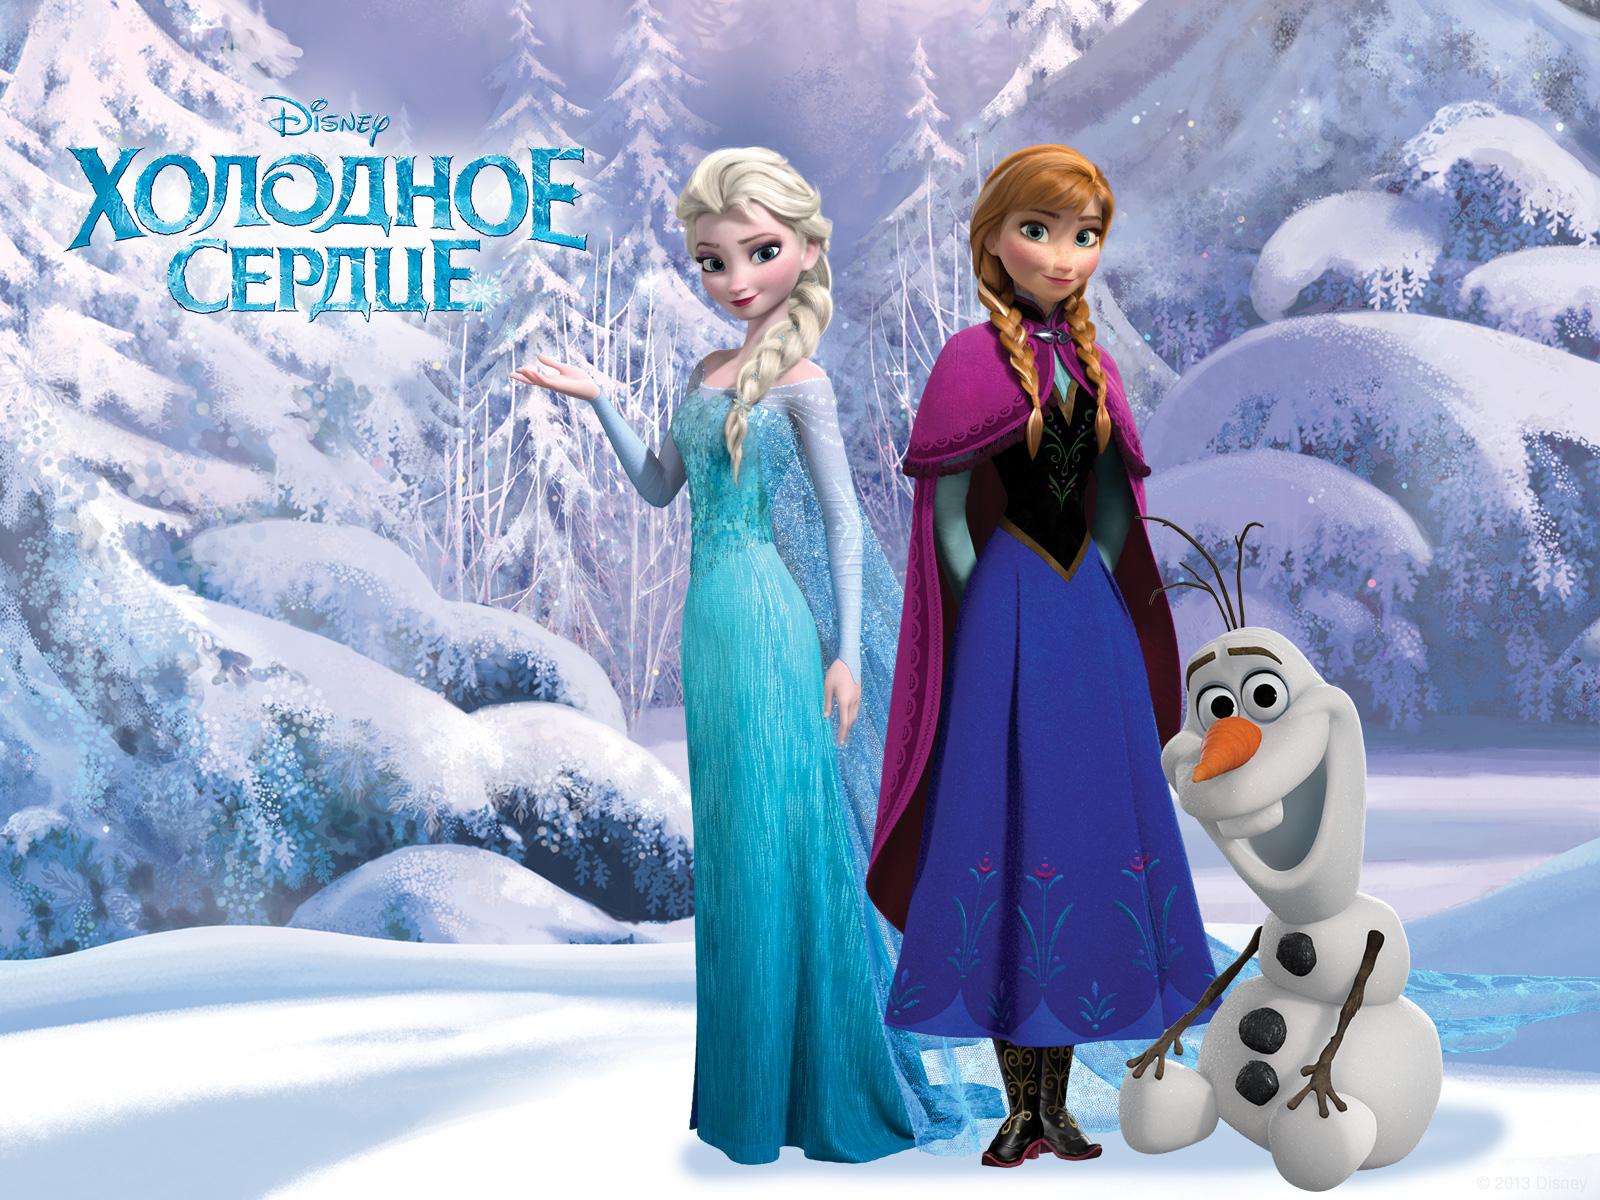 Elsa and Anna image elsa and anna 36252677 1600 1200jpg 1600x1200